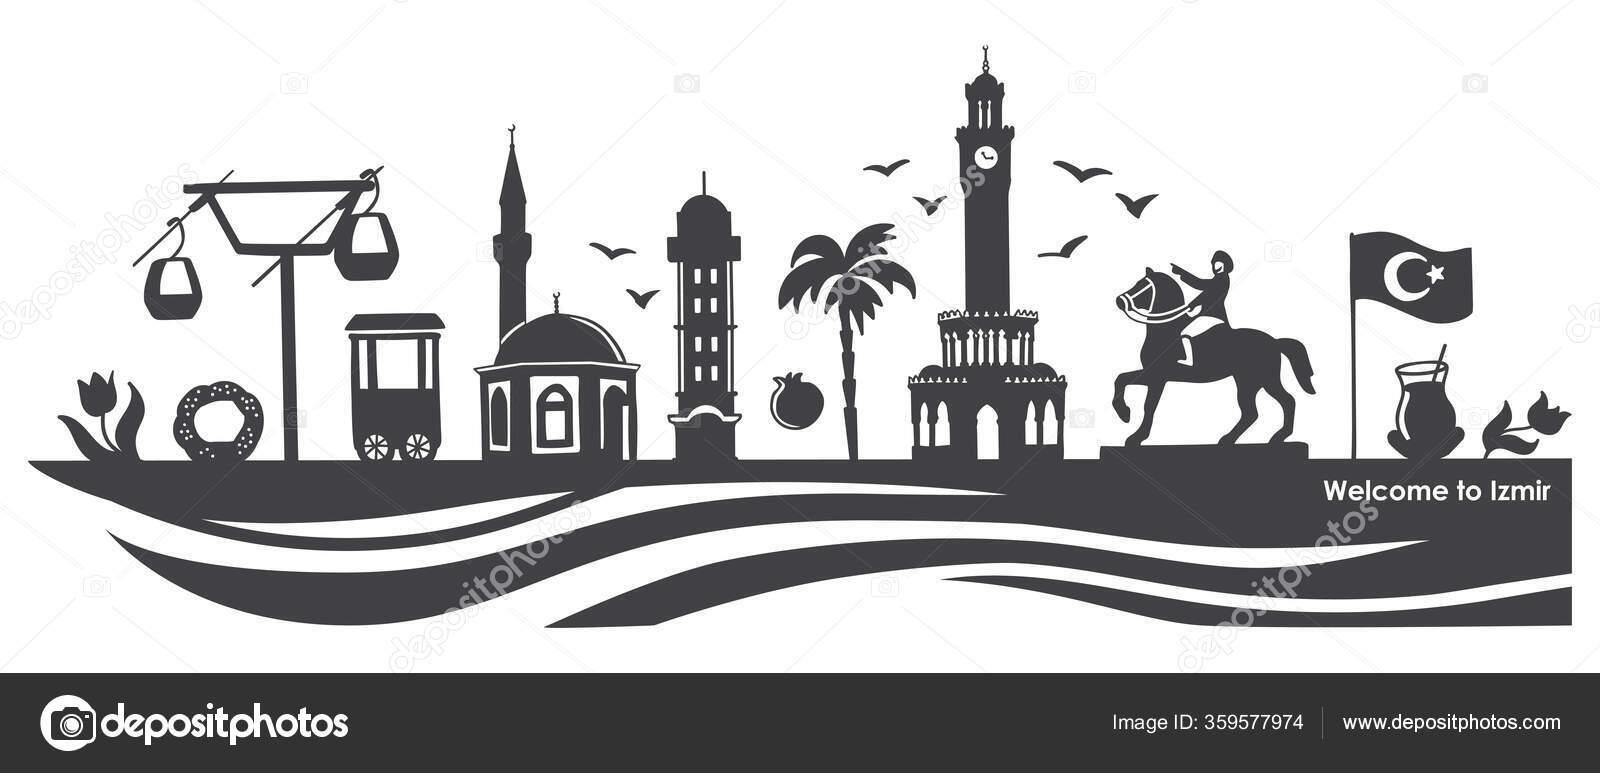 Vector Illustration Izmir Landmarks Famous Turkish Symbols Travel Turkey Concept Stock Vector C Aninata 359577974